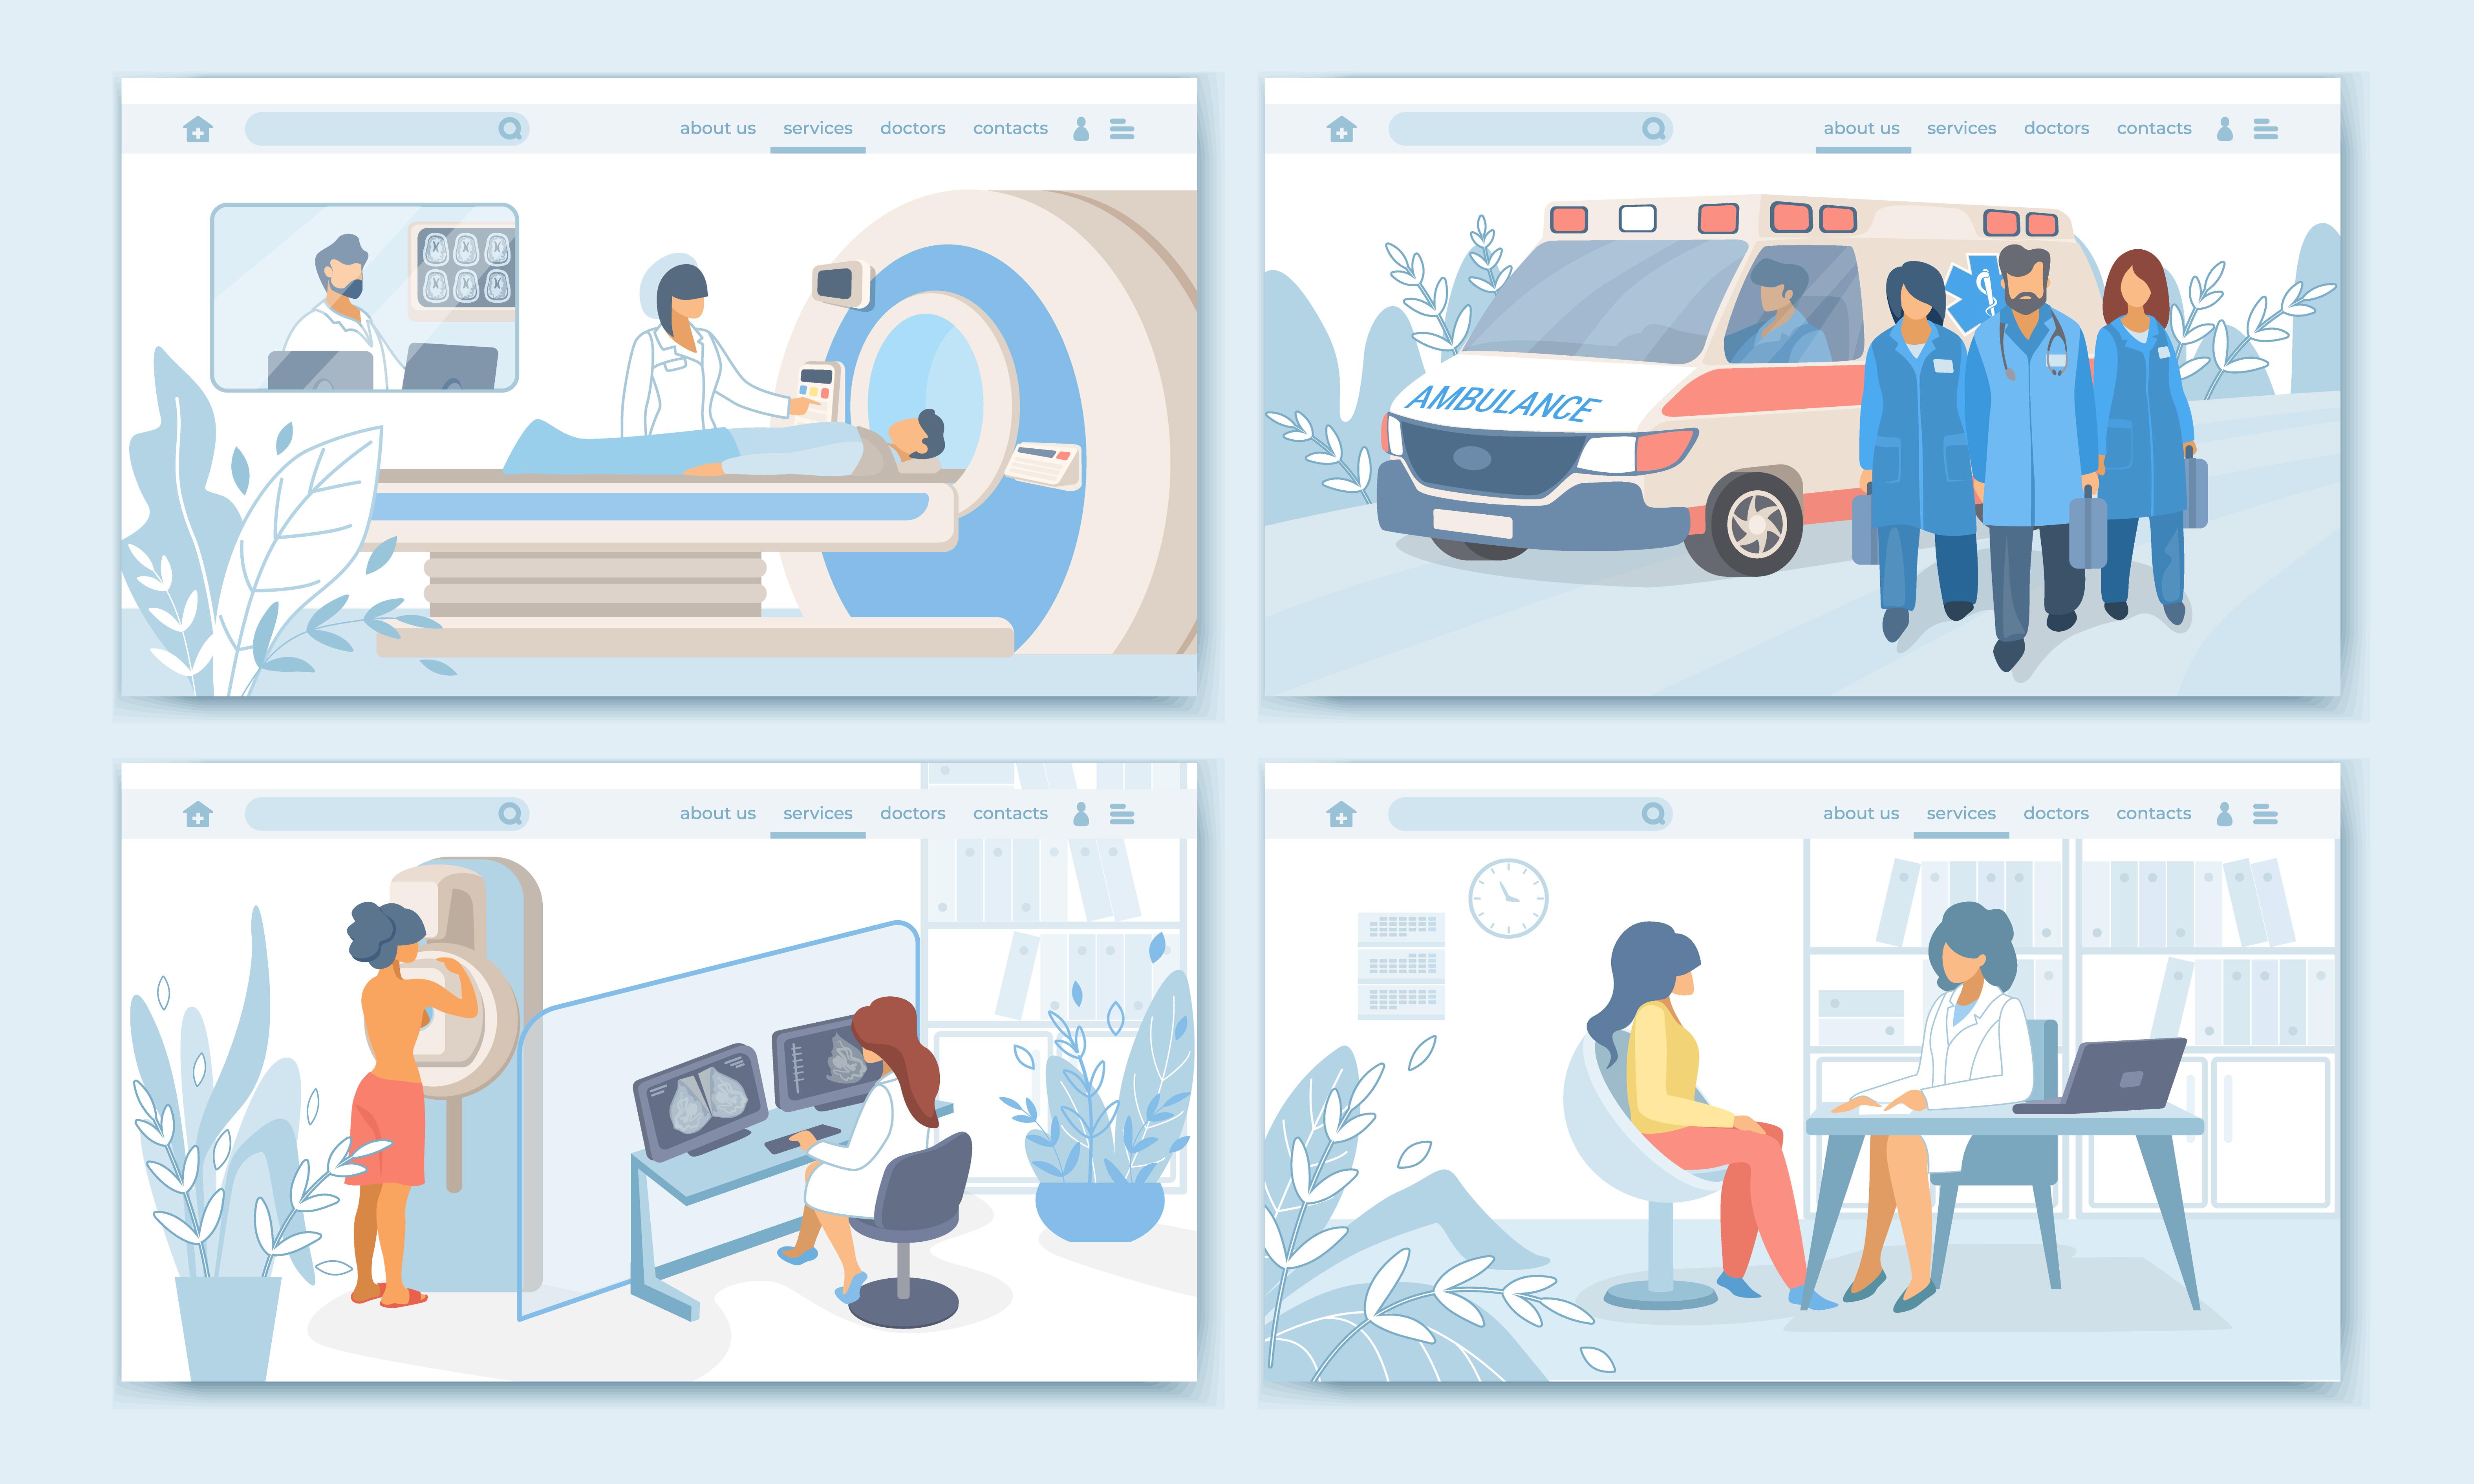 illustration of health and wellness website design for medical institutions